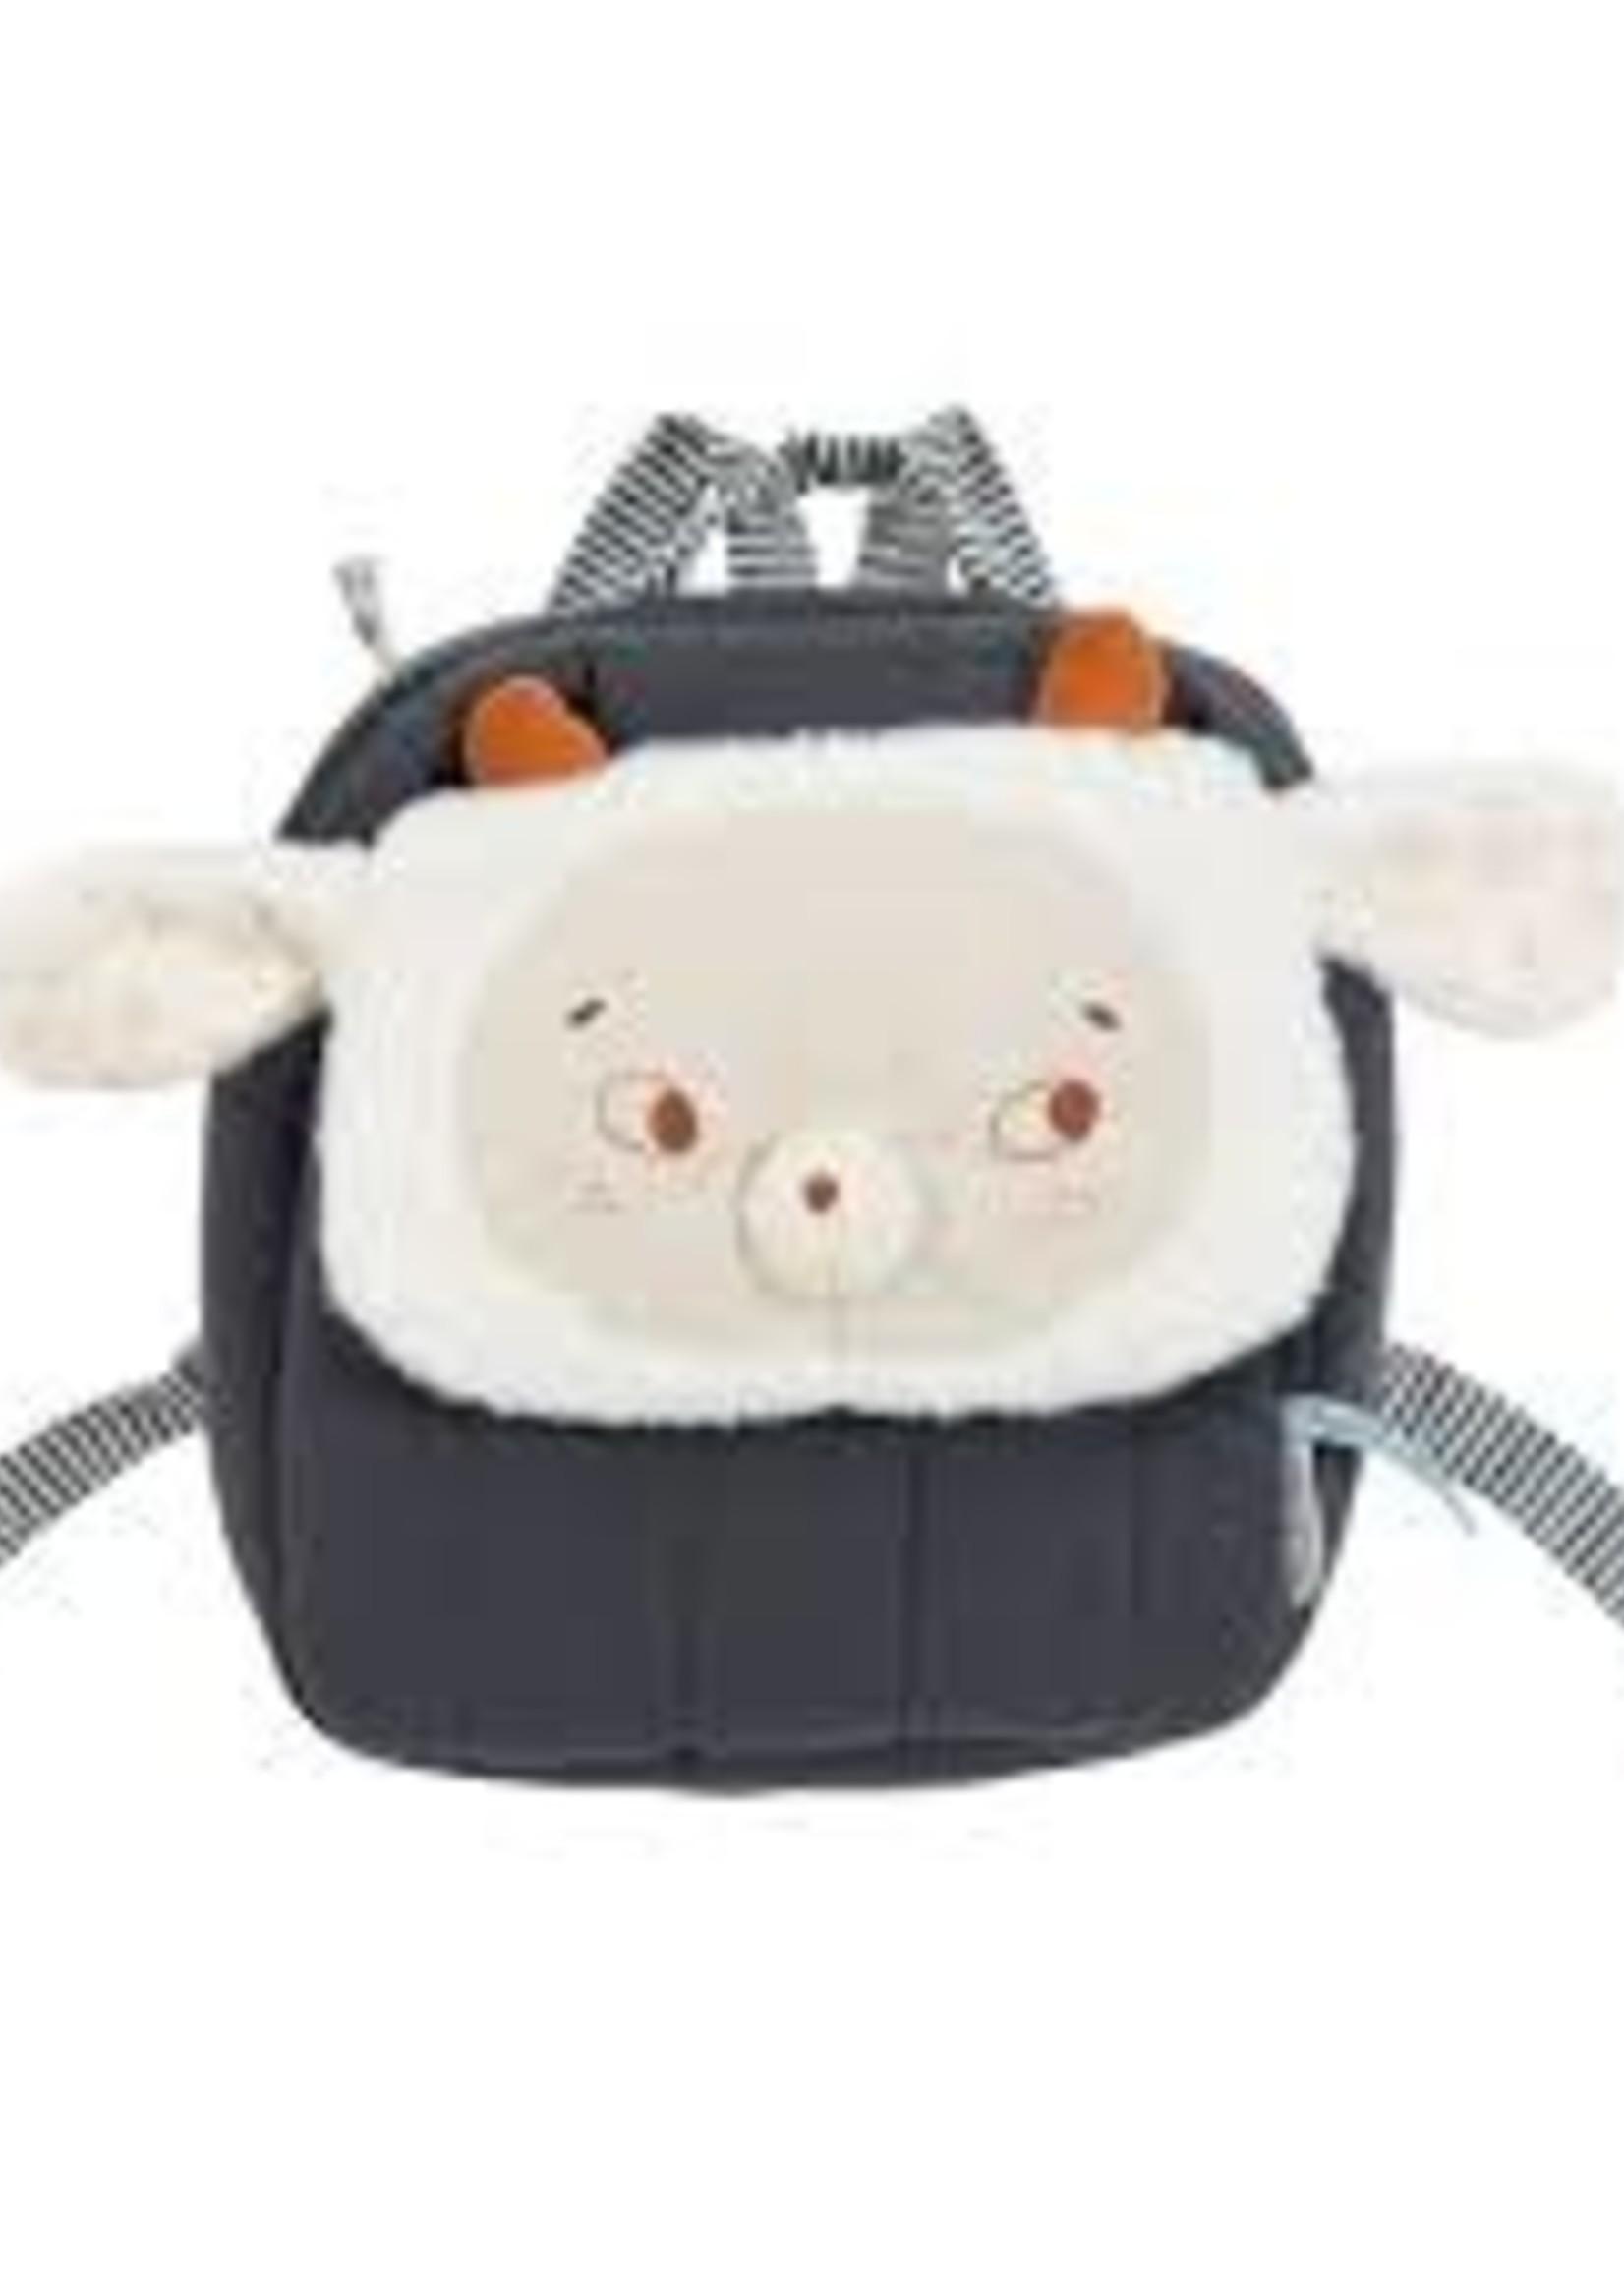 Mideer Moulin Roty SS21- 715071 Nuage sheep backpack